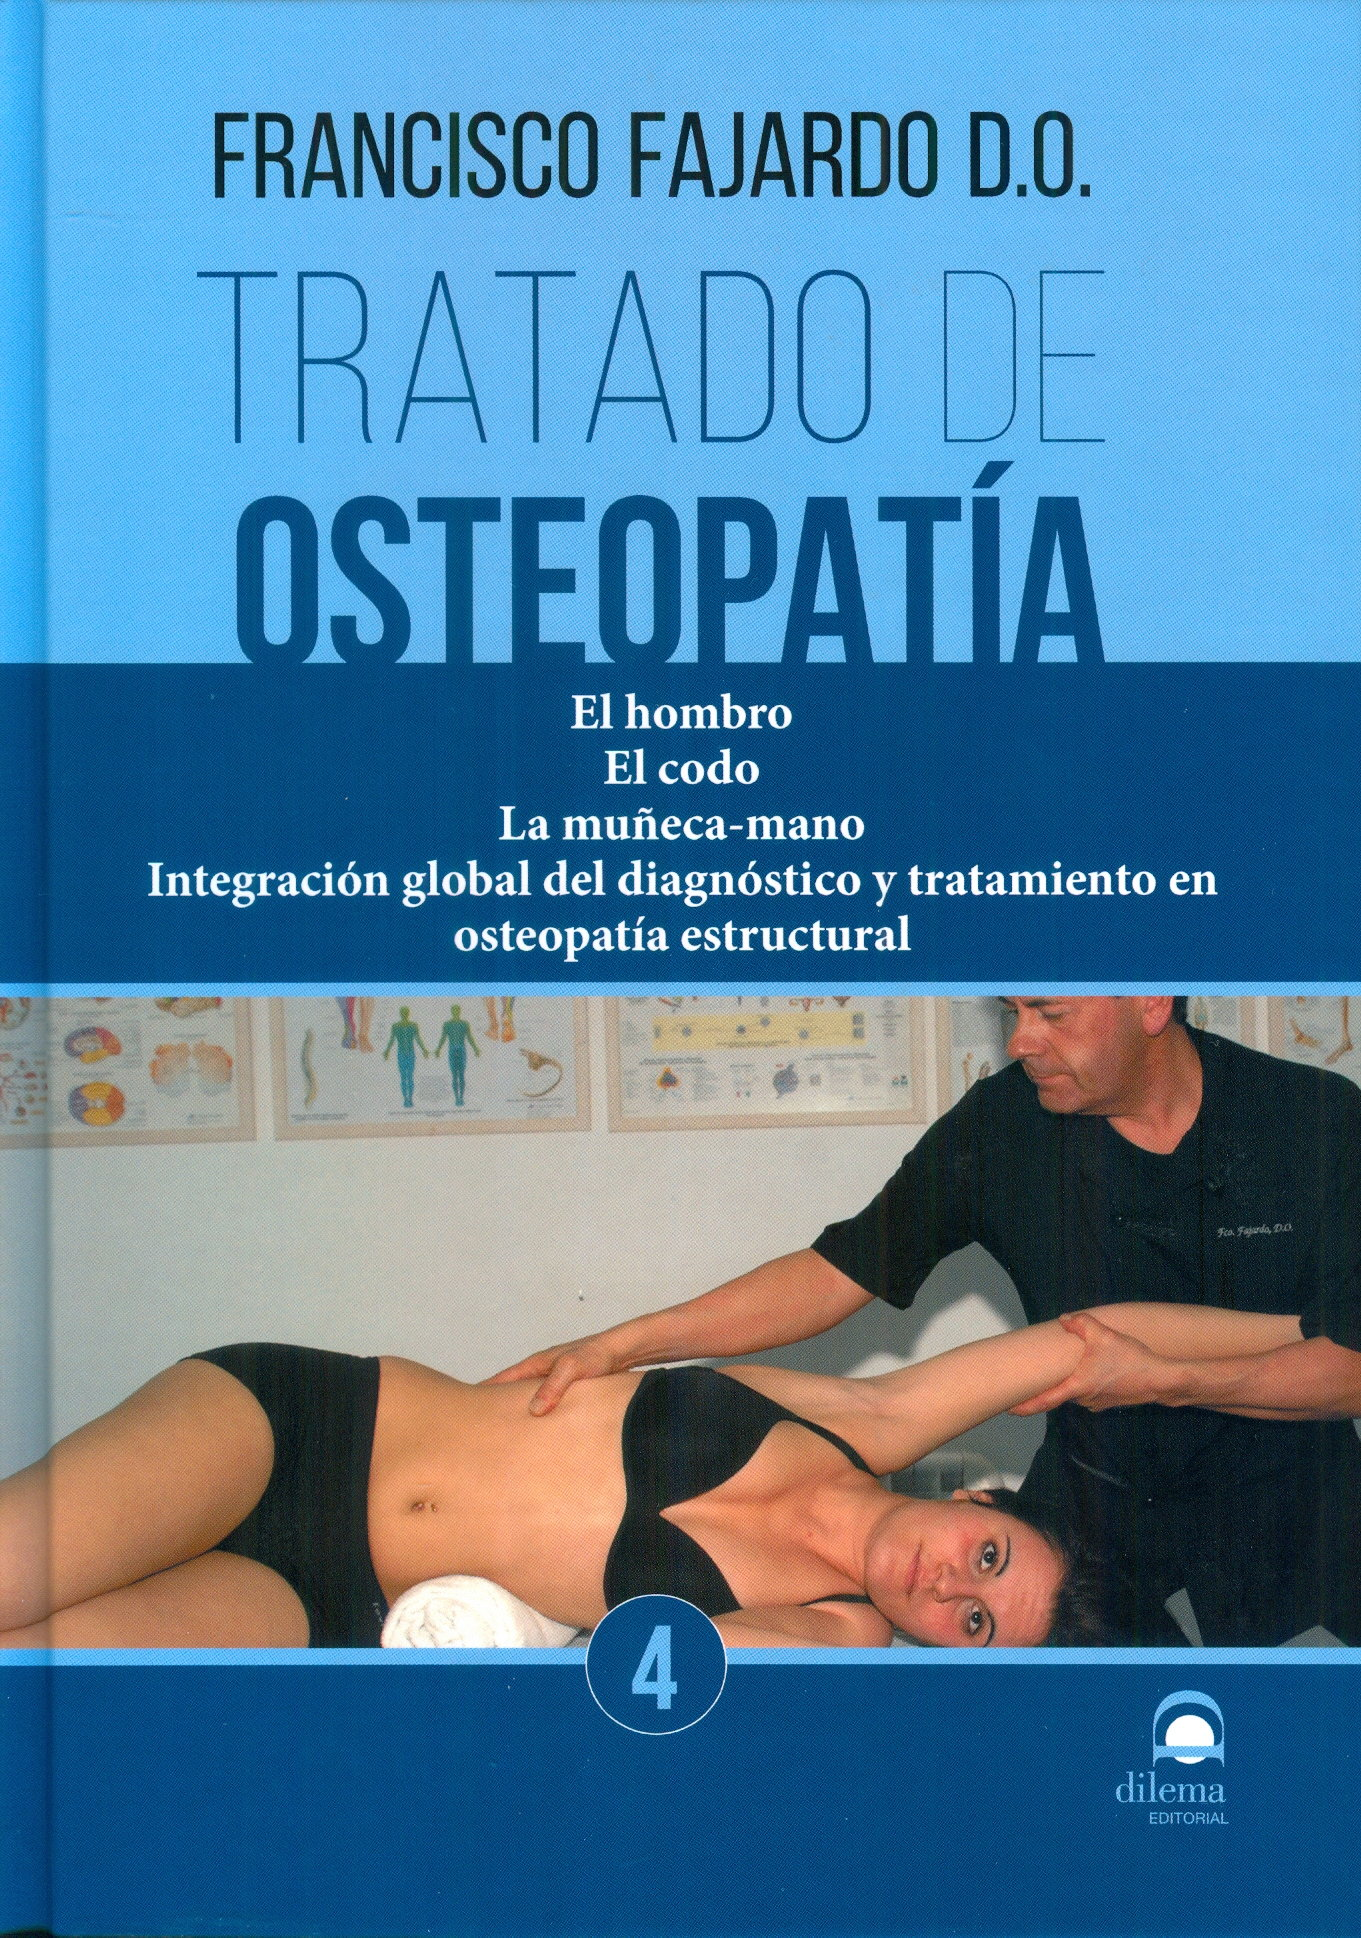 Tratado de osteopatía 4 Image